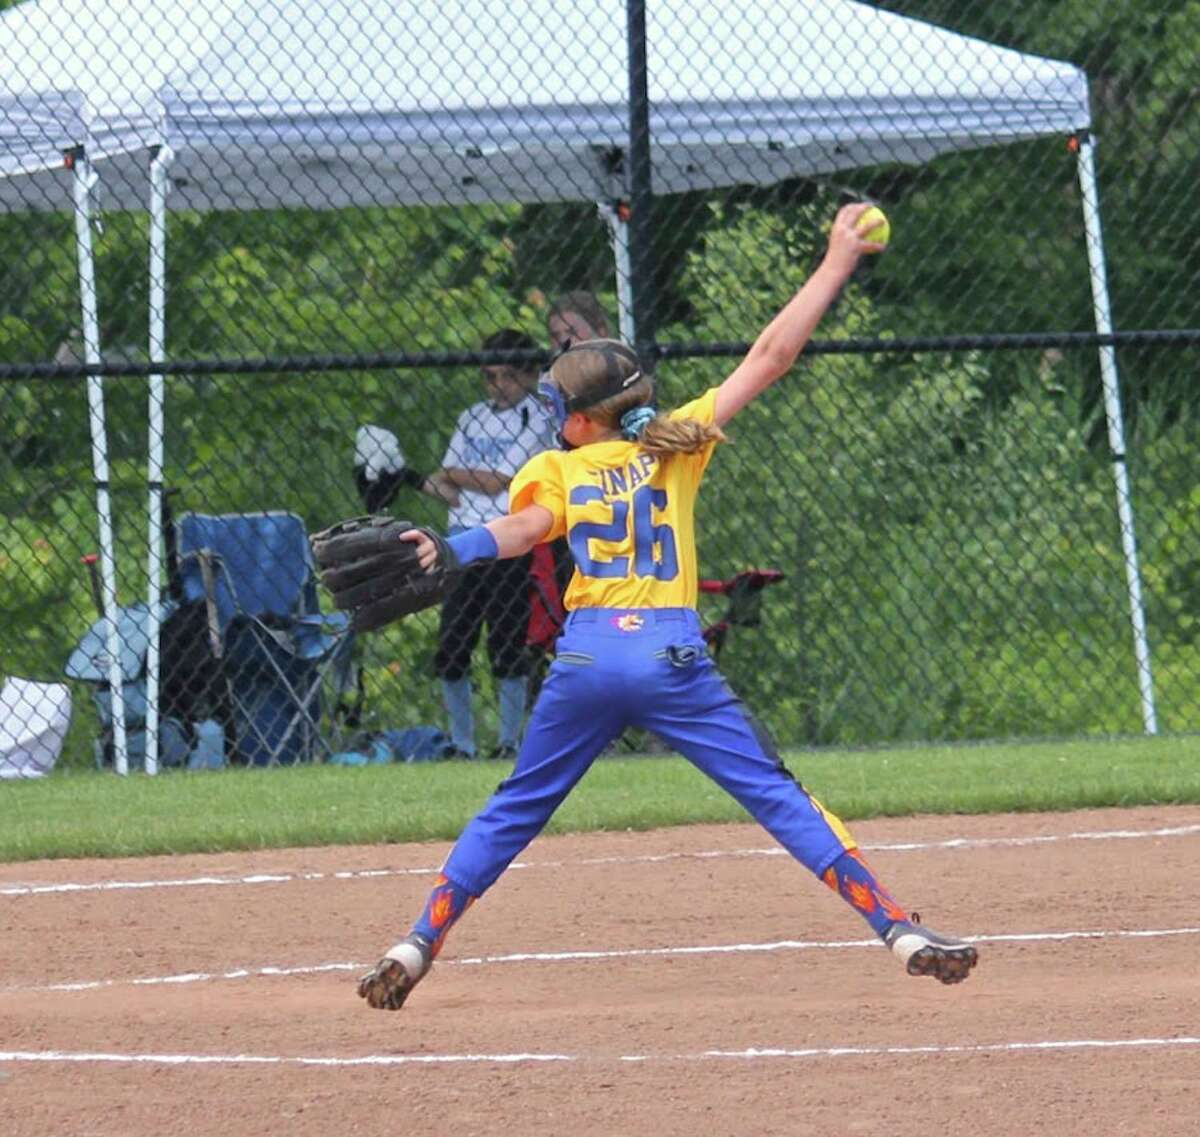 Brookfield Burn U10 girls' softball team is headed to Florida for the World Series today. Olivia Sinapi, #26